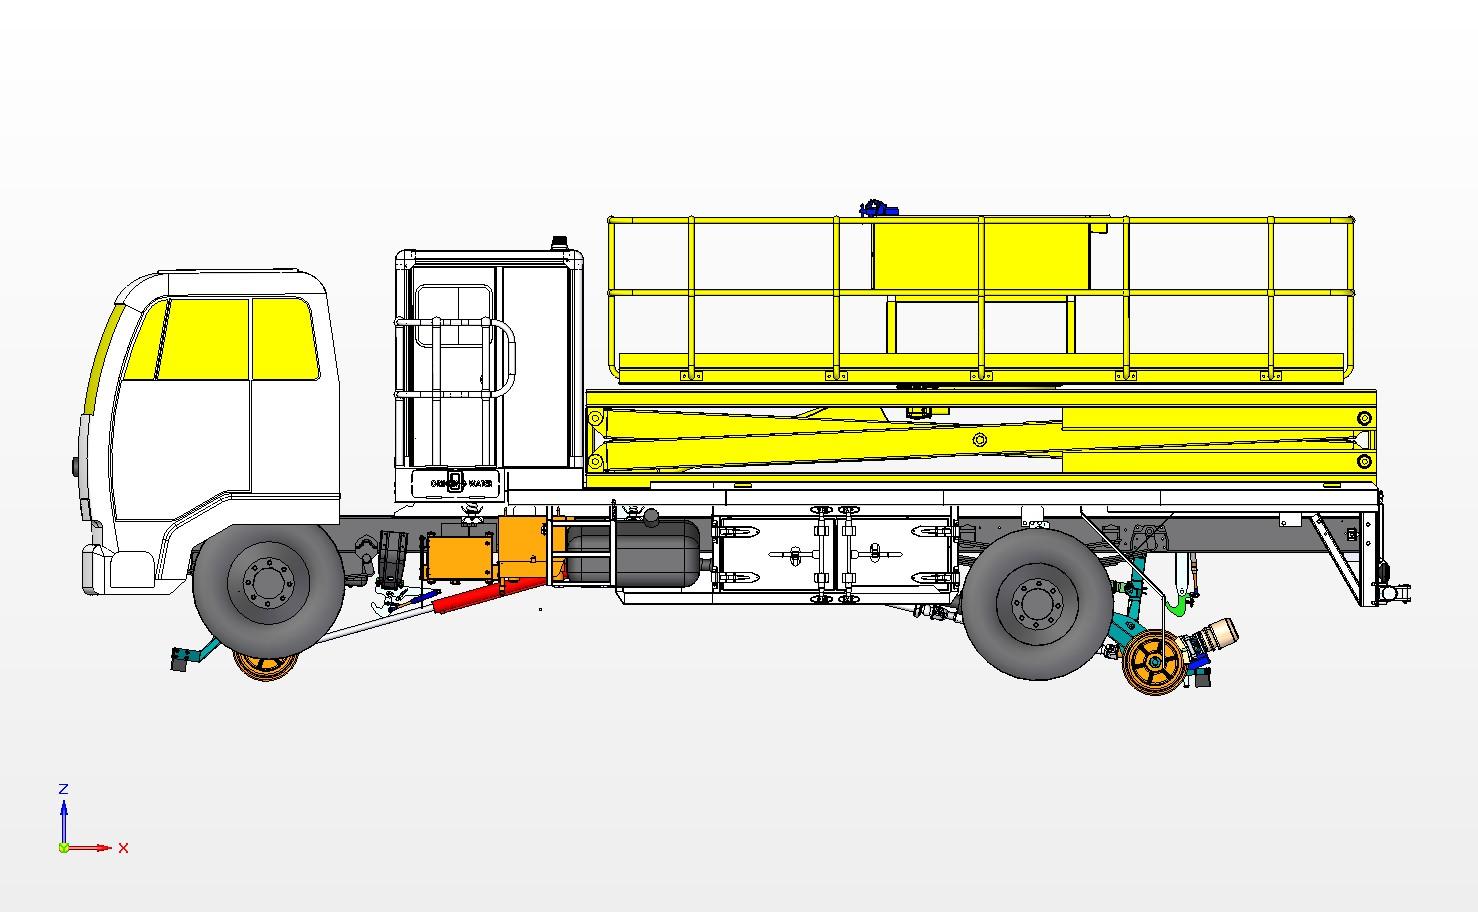 News Railpro Rrvs Train Diesel Engine Diagram Receives Order To Commission Scissor Lift Aerial Platform Rrv